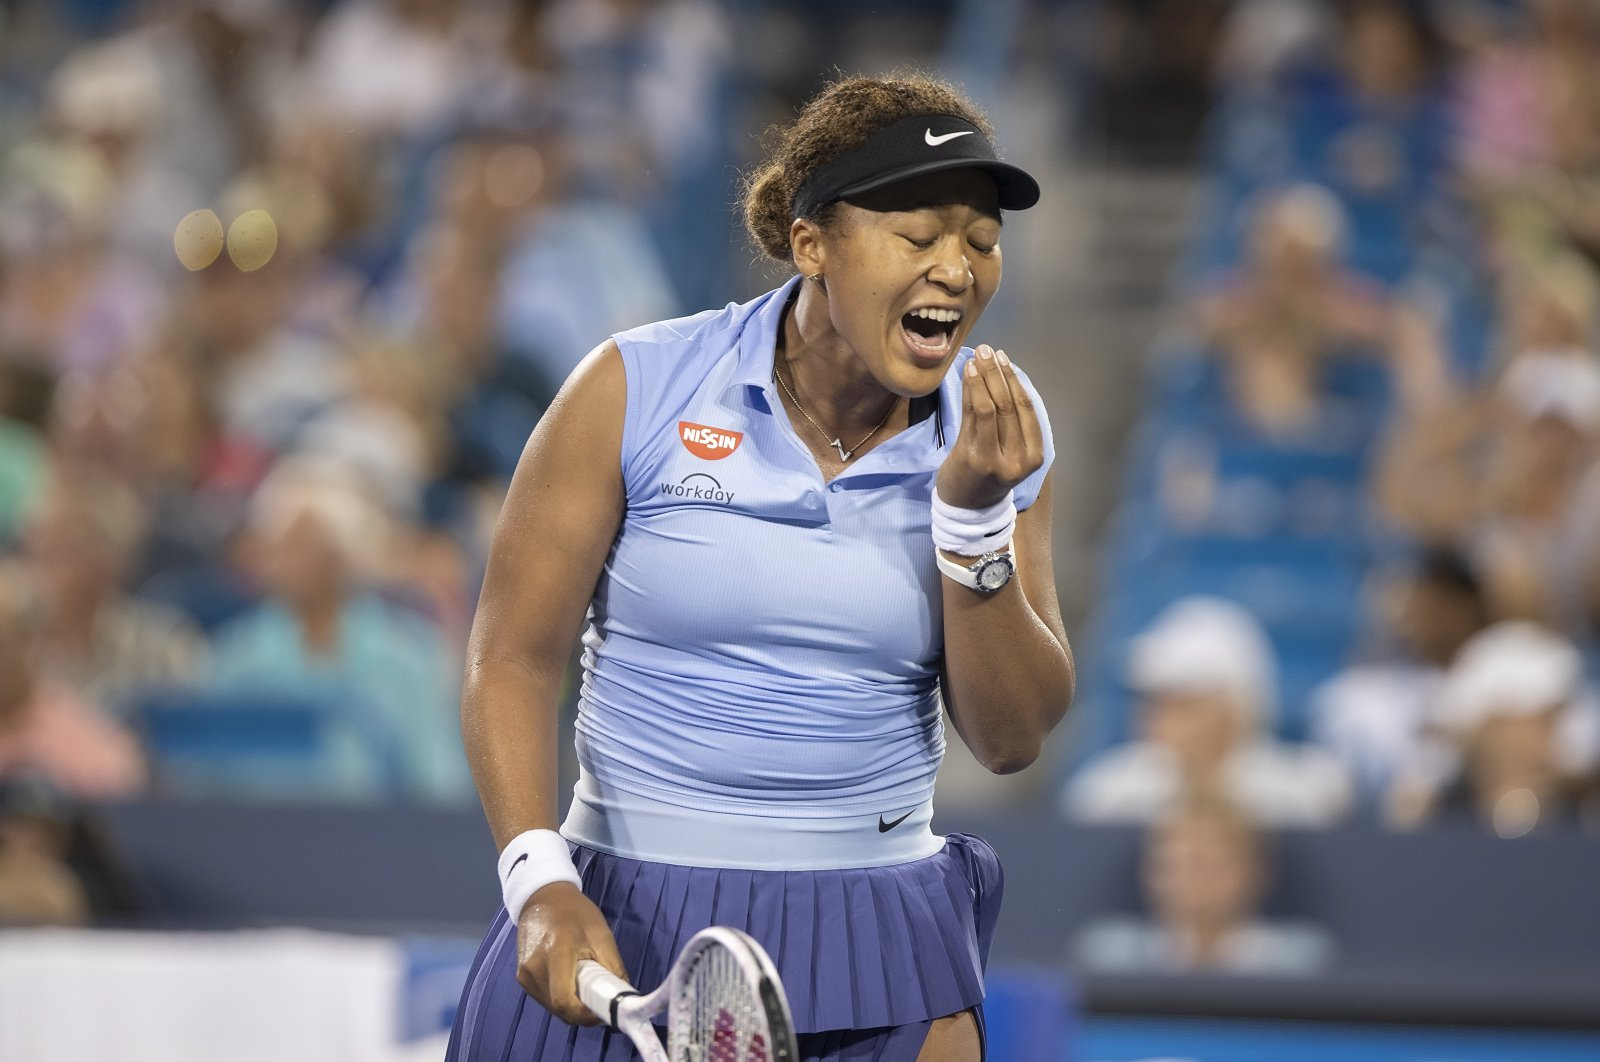 Japan's Naomi Osaka reacts during a Cincinnati Masters third-round match against Switzerland's Jil Teichmann at the Lindner Family Tennis Center, Mason, Ohio, USA, Aug 19, 2021. (Reuters Photo)